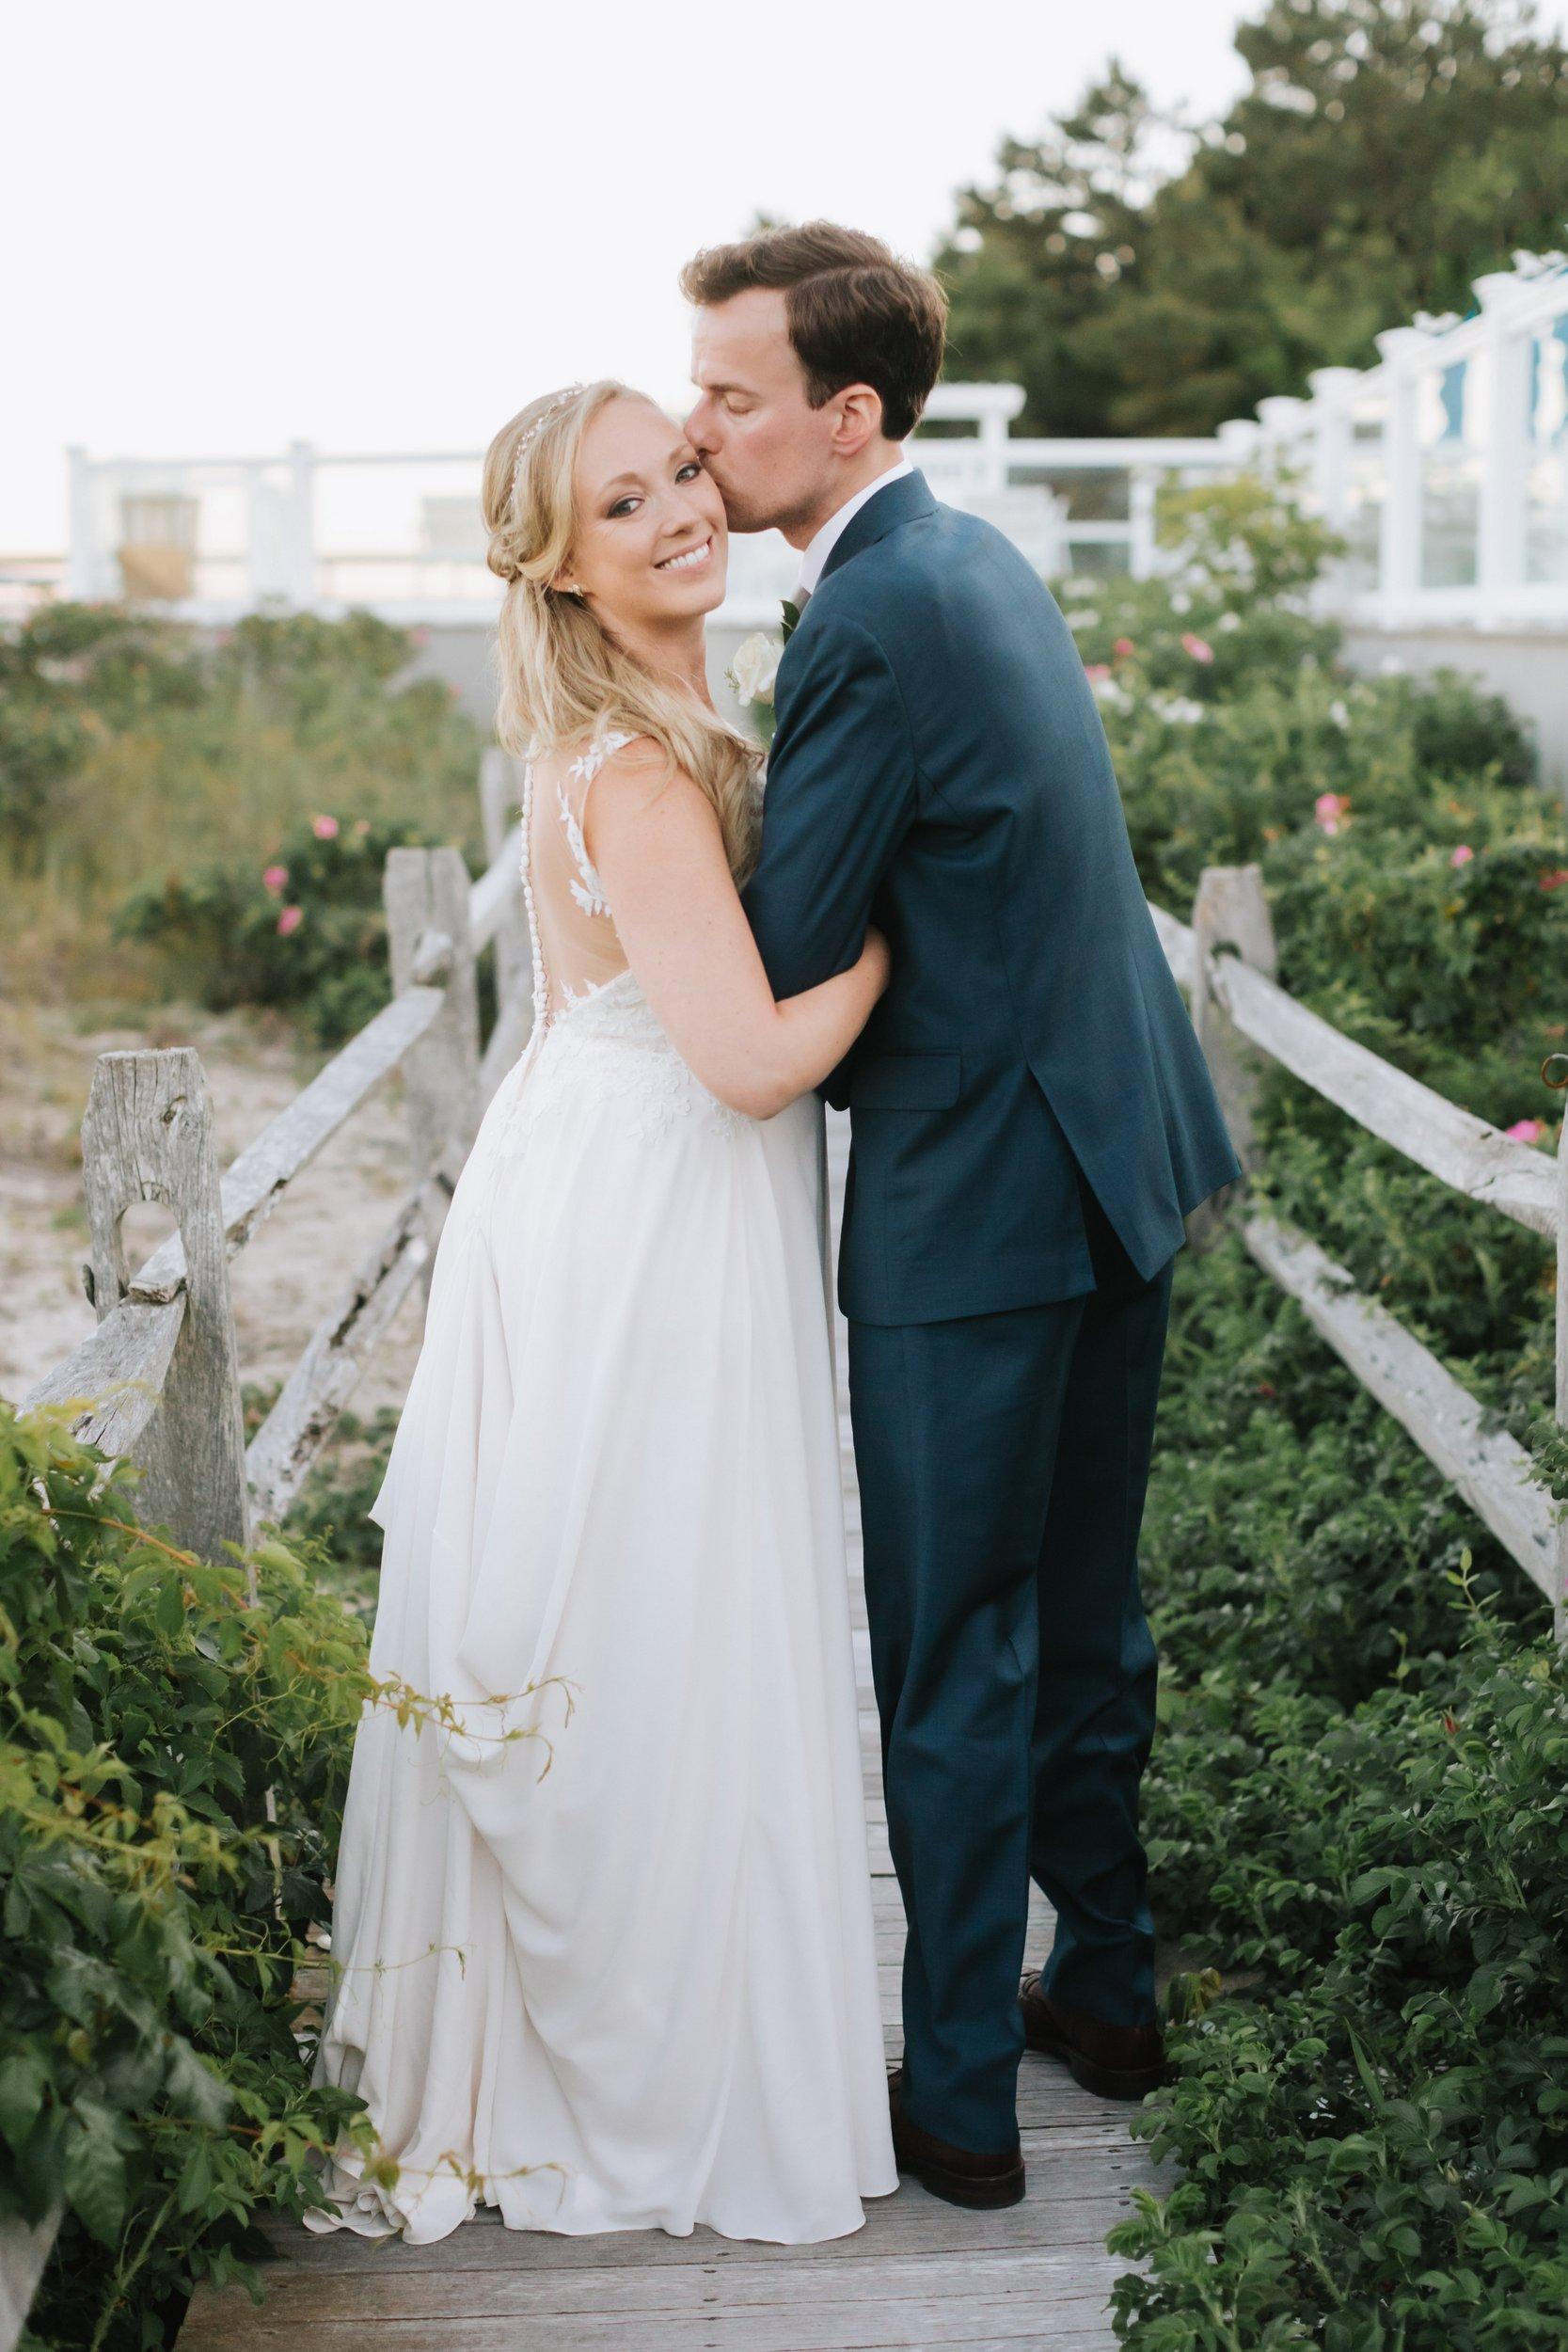 Popponesset-Inn-Wedding-Cape-Cod-Lena-Mirisola-Photography-48.jpg